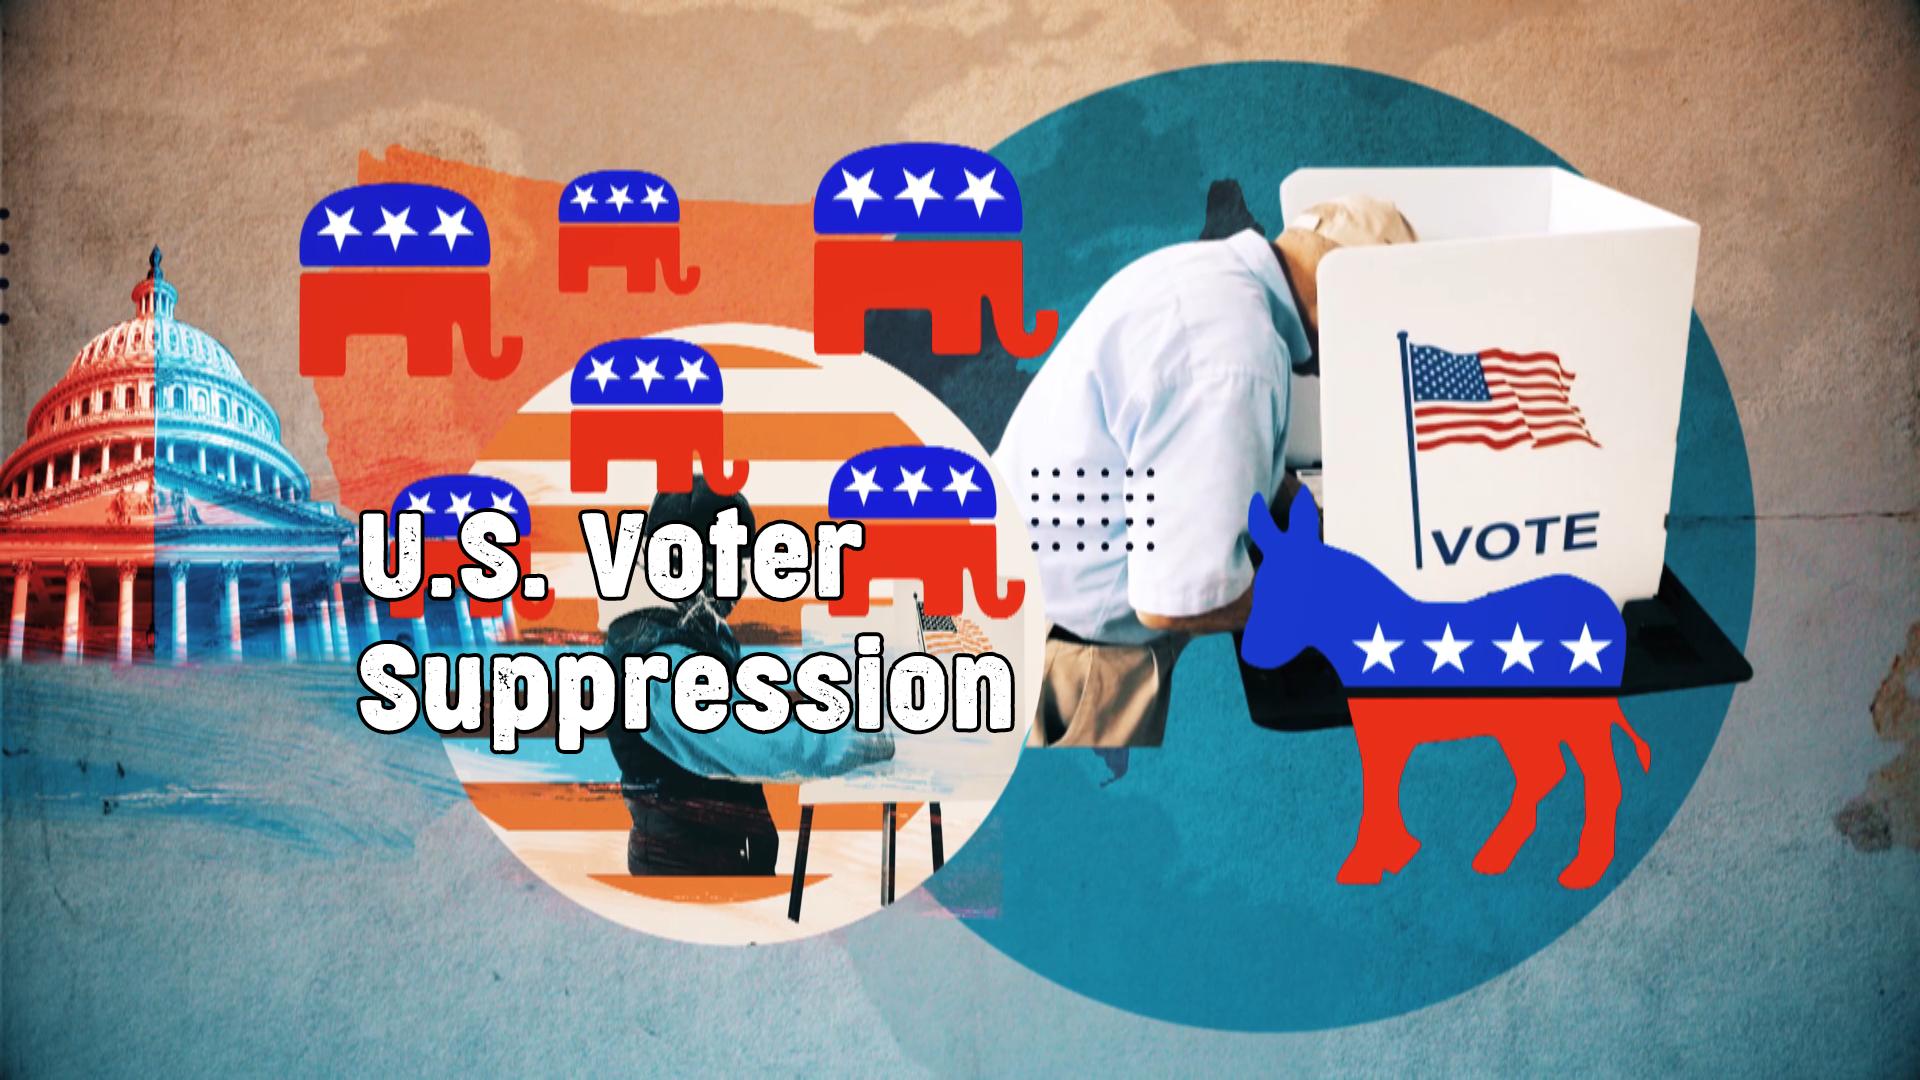 US voter suppression